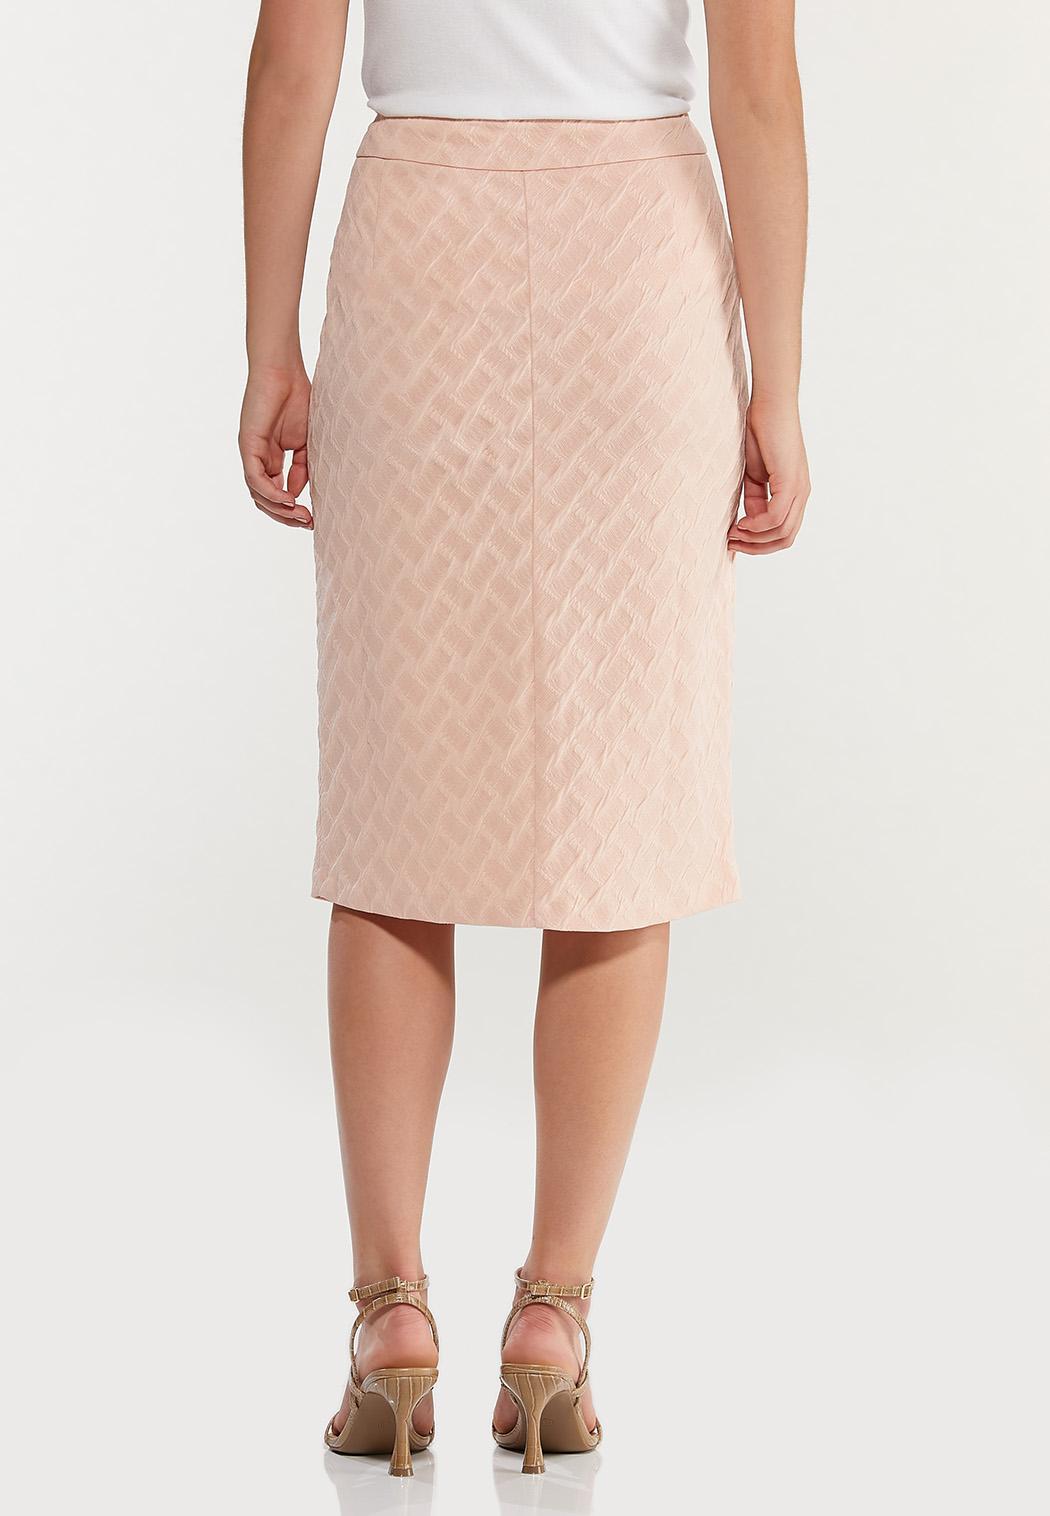 Textured Blush Pencil Skirt (Item #44491680)